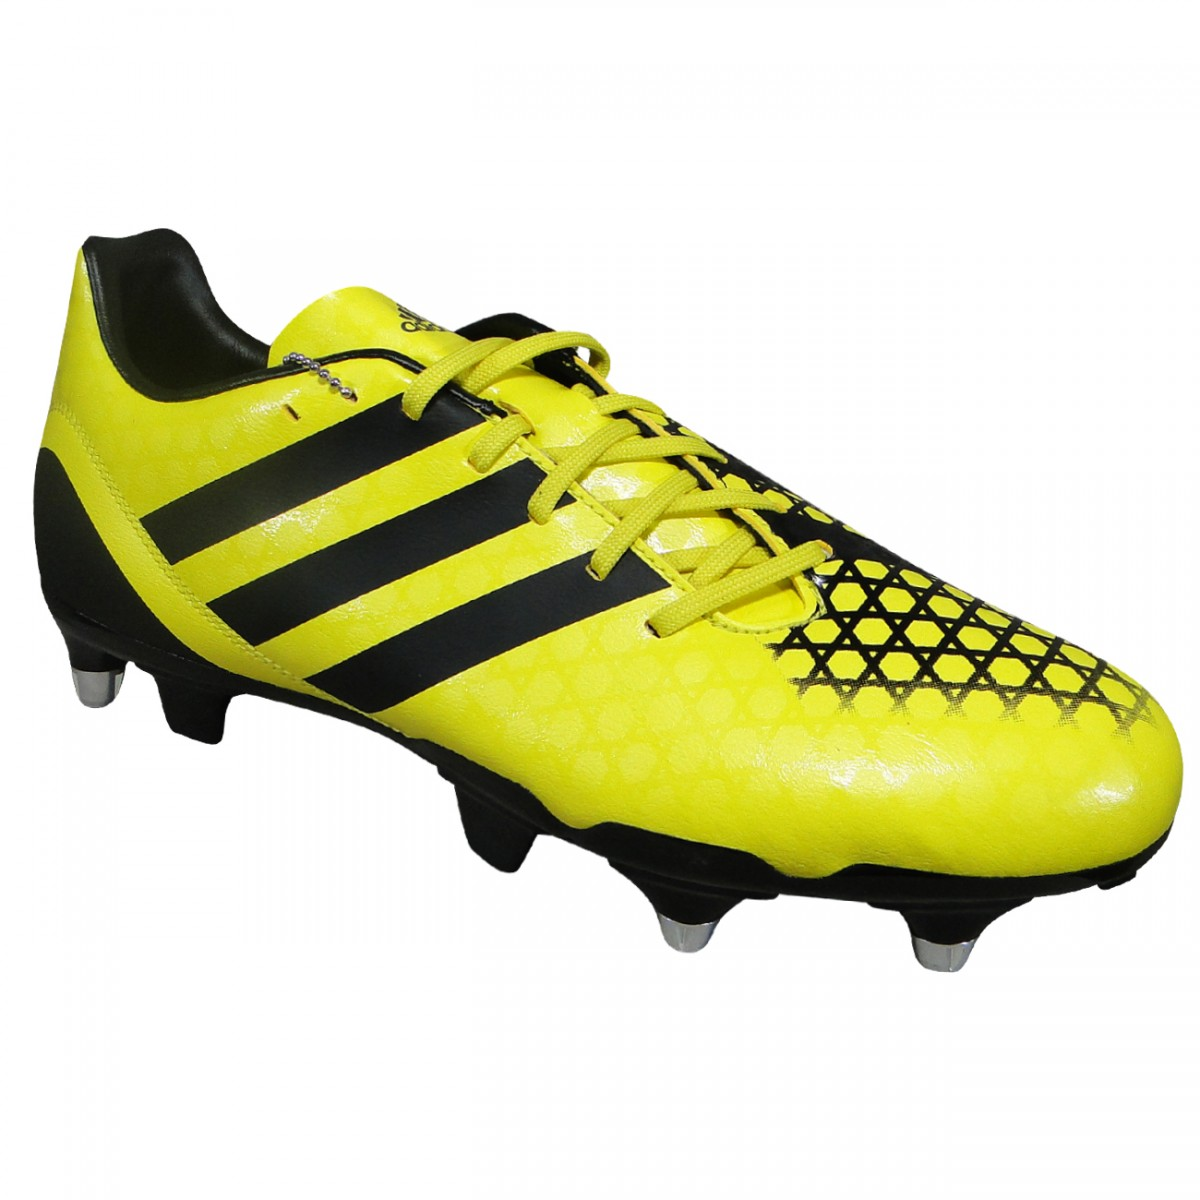 9bebd4b1fa Chuteira Adidas Incurza B23058 - Amarelo Preto - Chuteira Nike ...